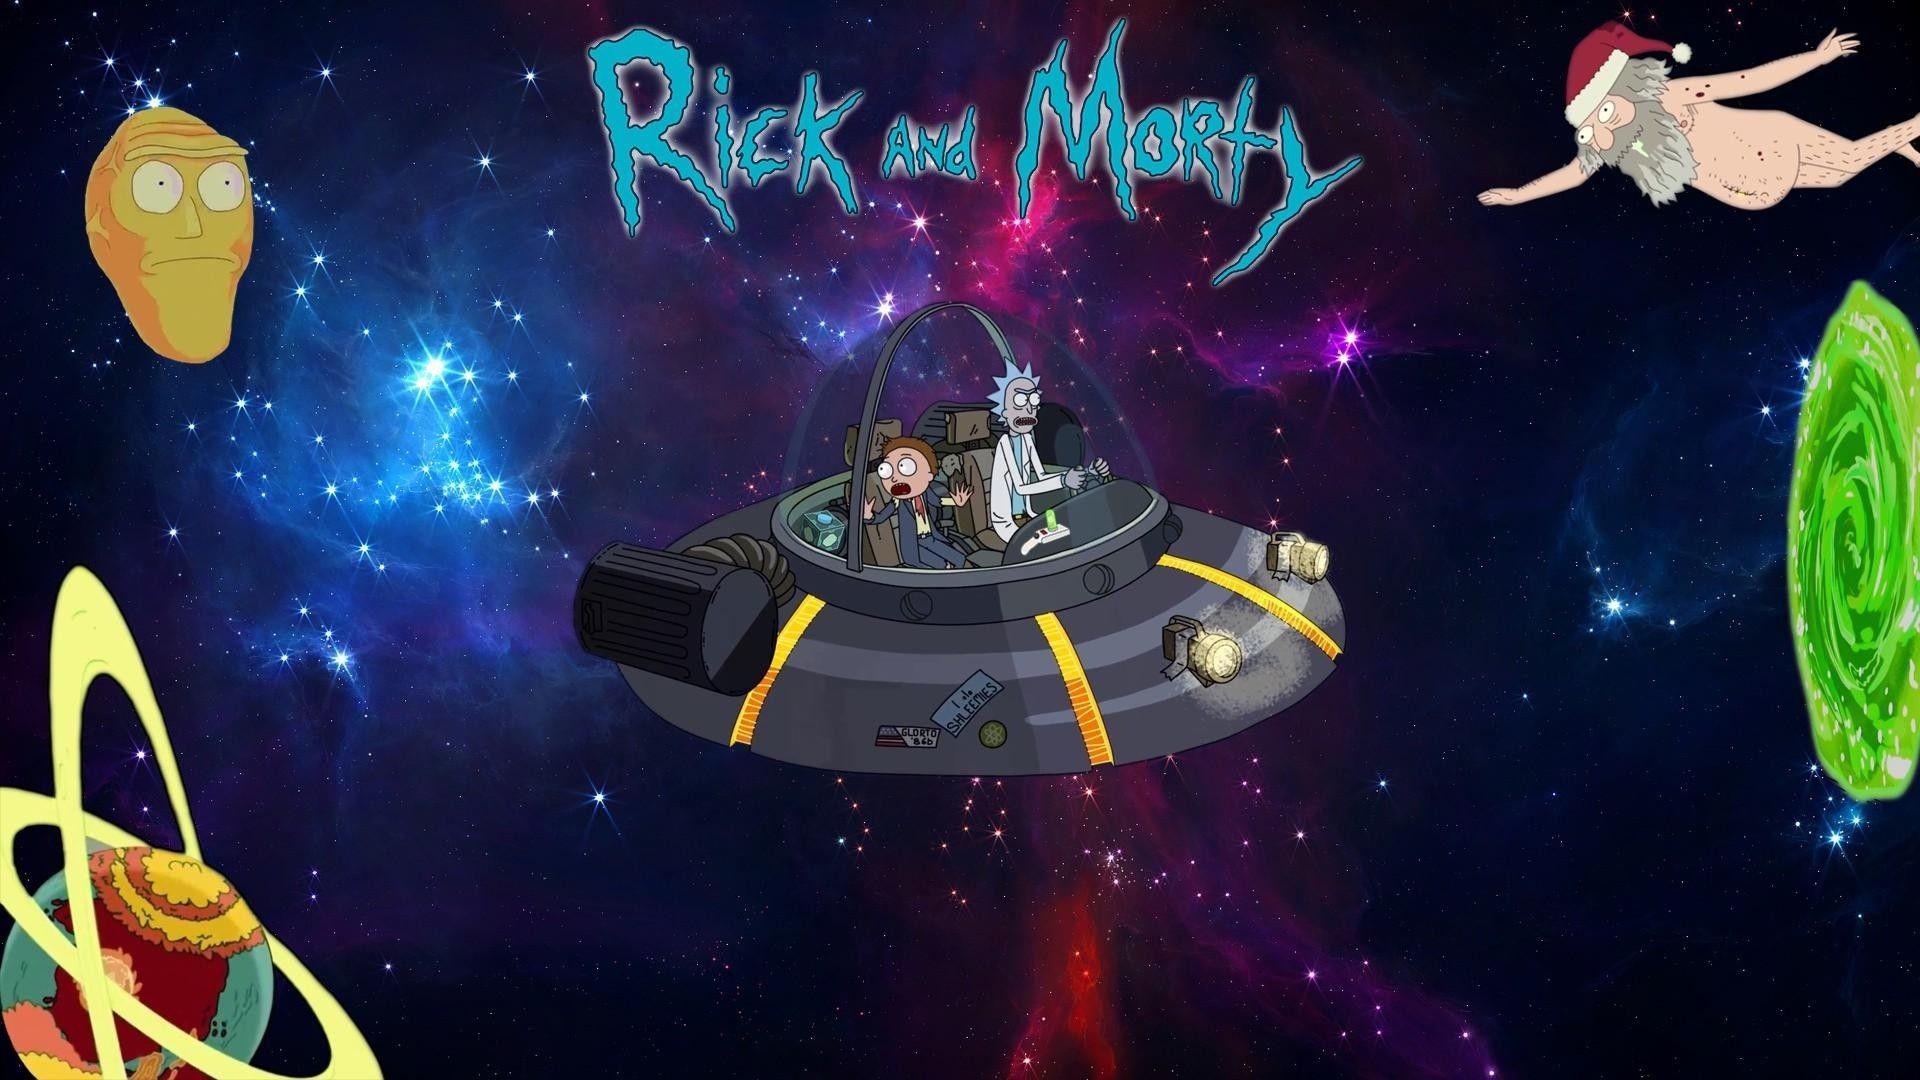 Rick and Morty Desktop Backgrounds HD | Sfondi, Mac